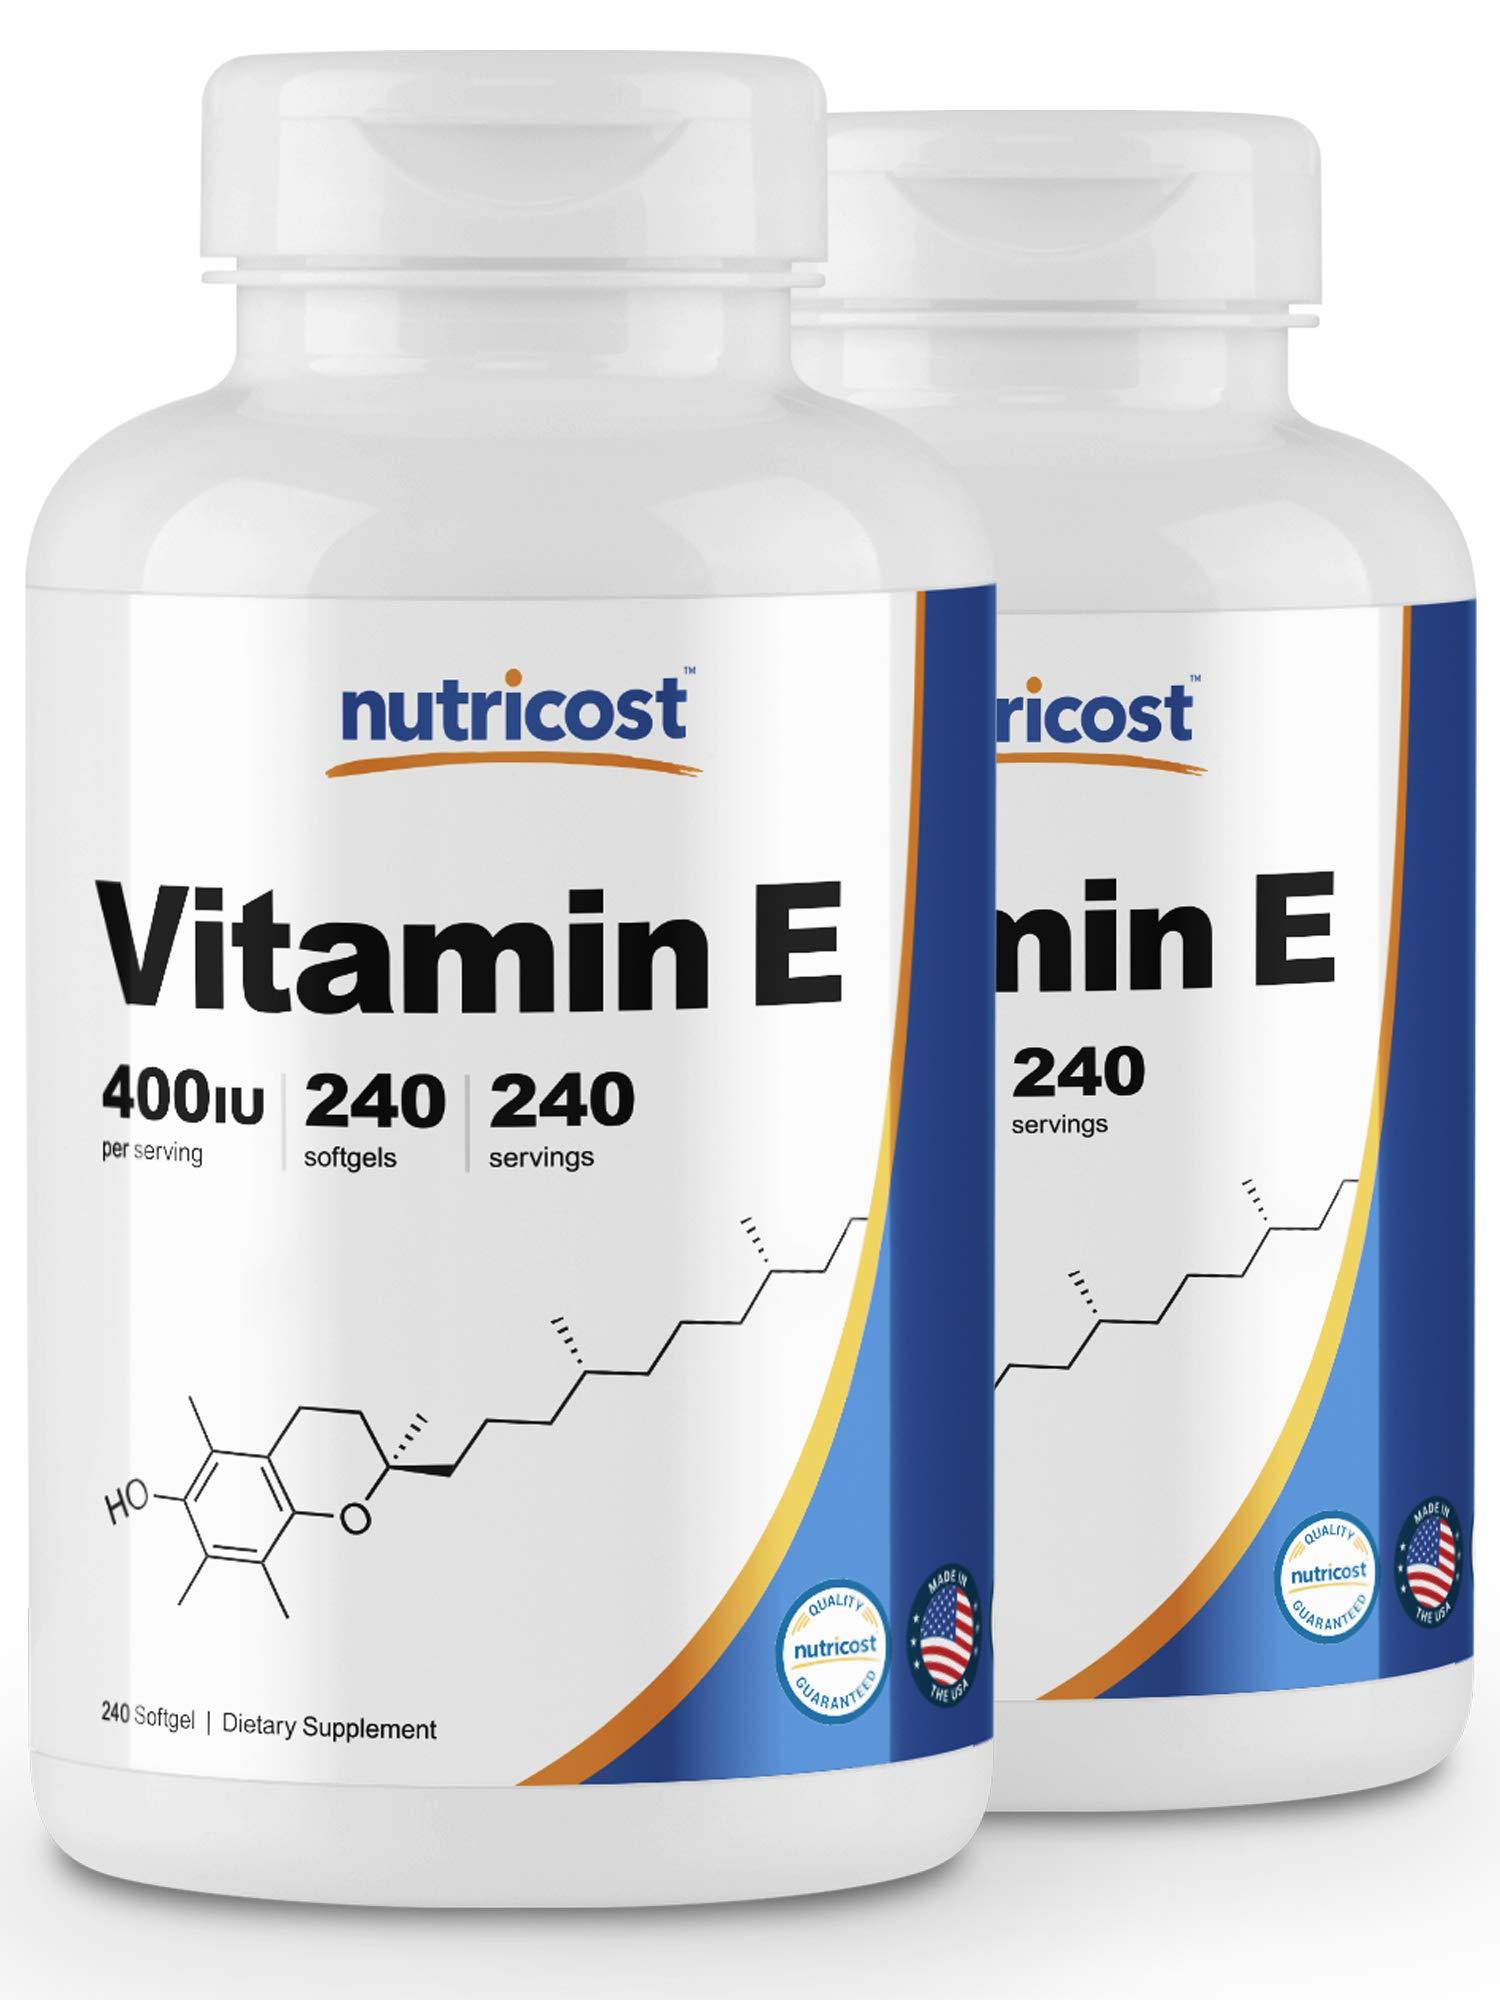 Nutricost Vitamin E 400 IU, 240 Softgel Capsules (2 Bottles)